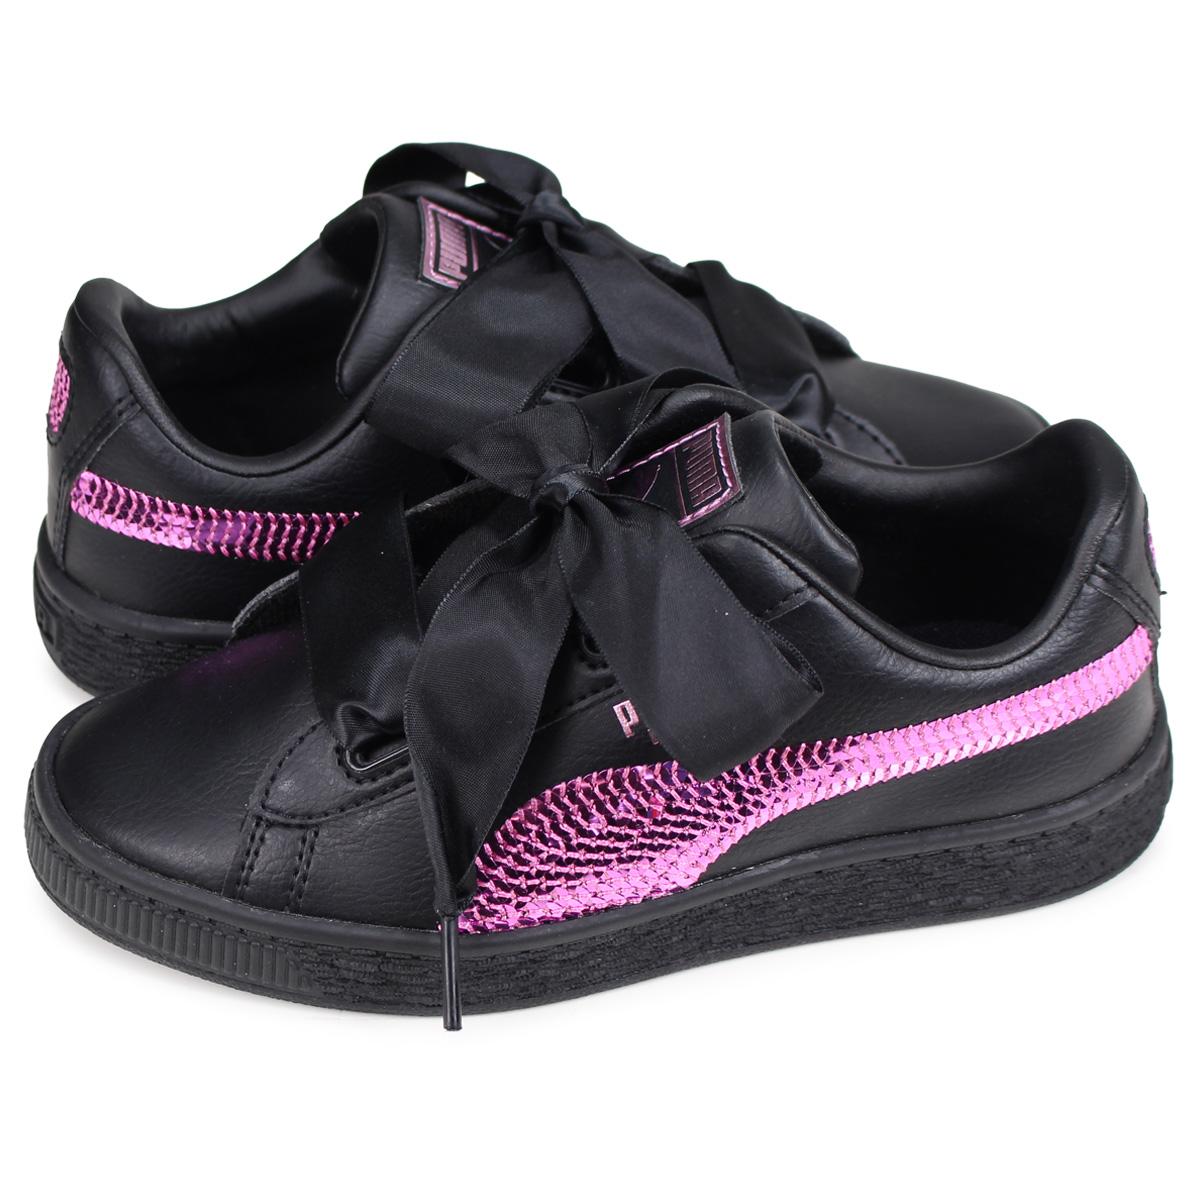 finest selection f798d 39752 PUMA BASKET HEART BLING PS Puma basket heart sneakers kids black black  36684801